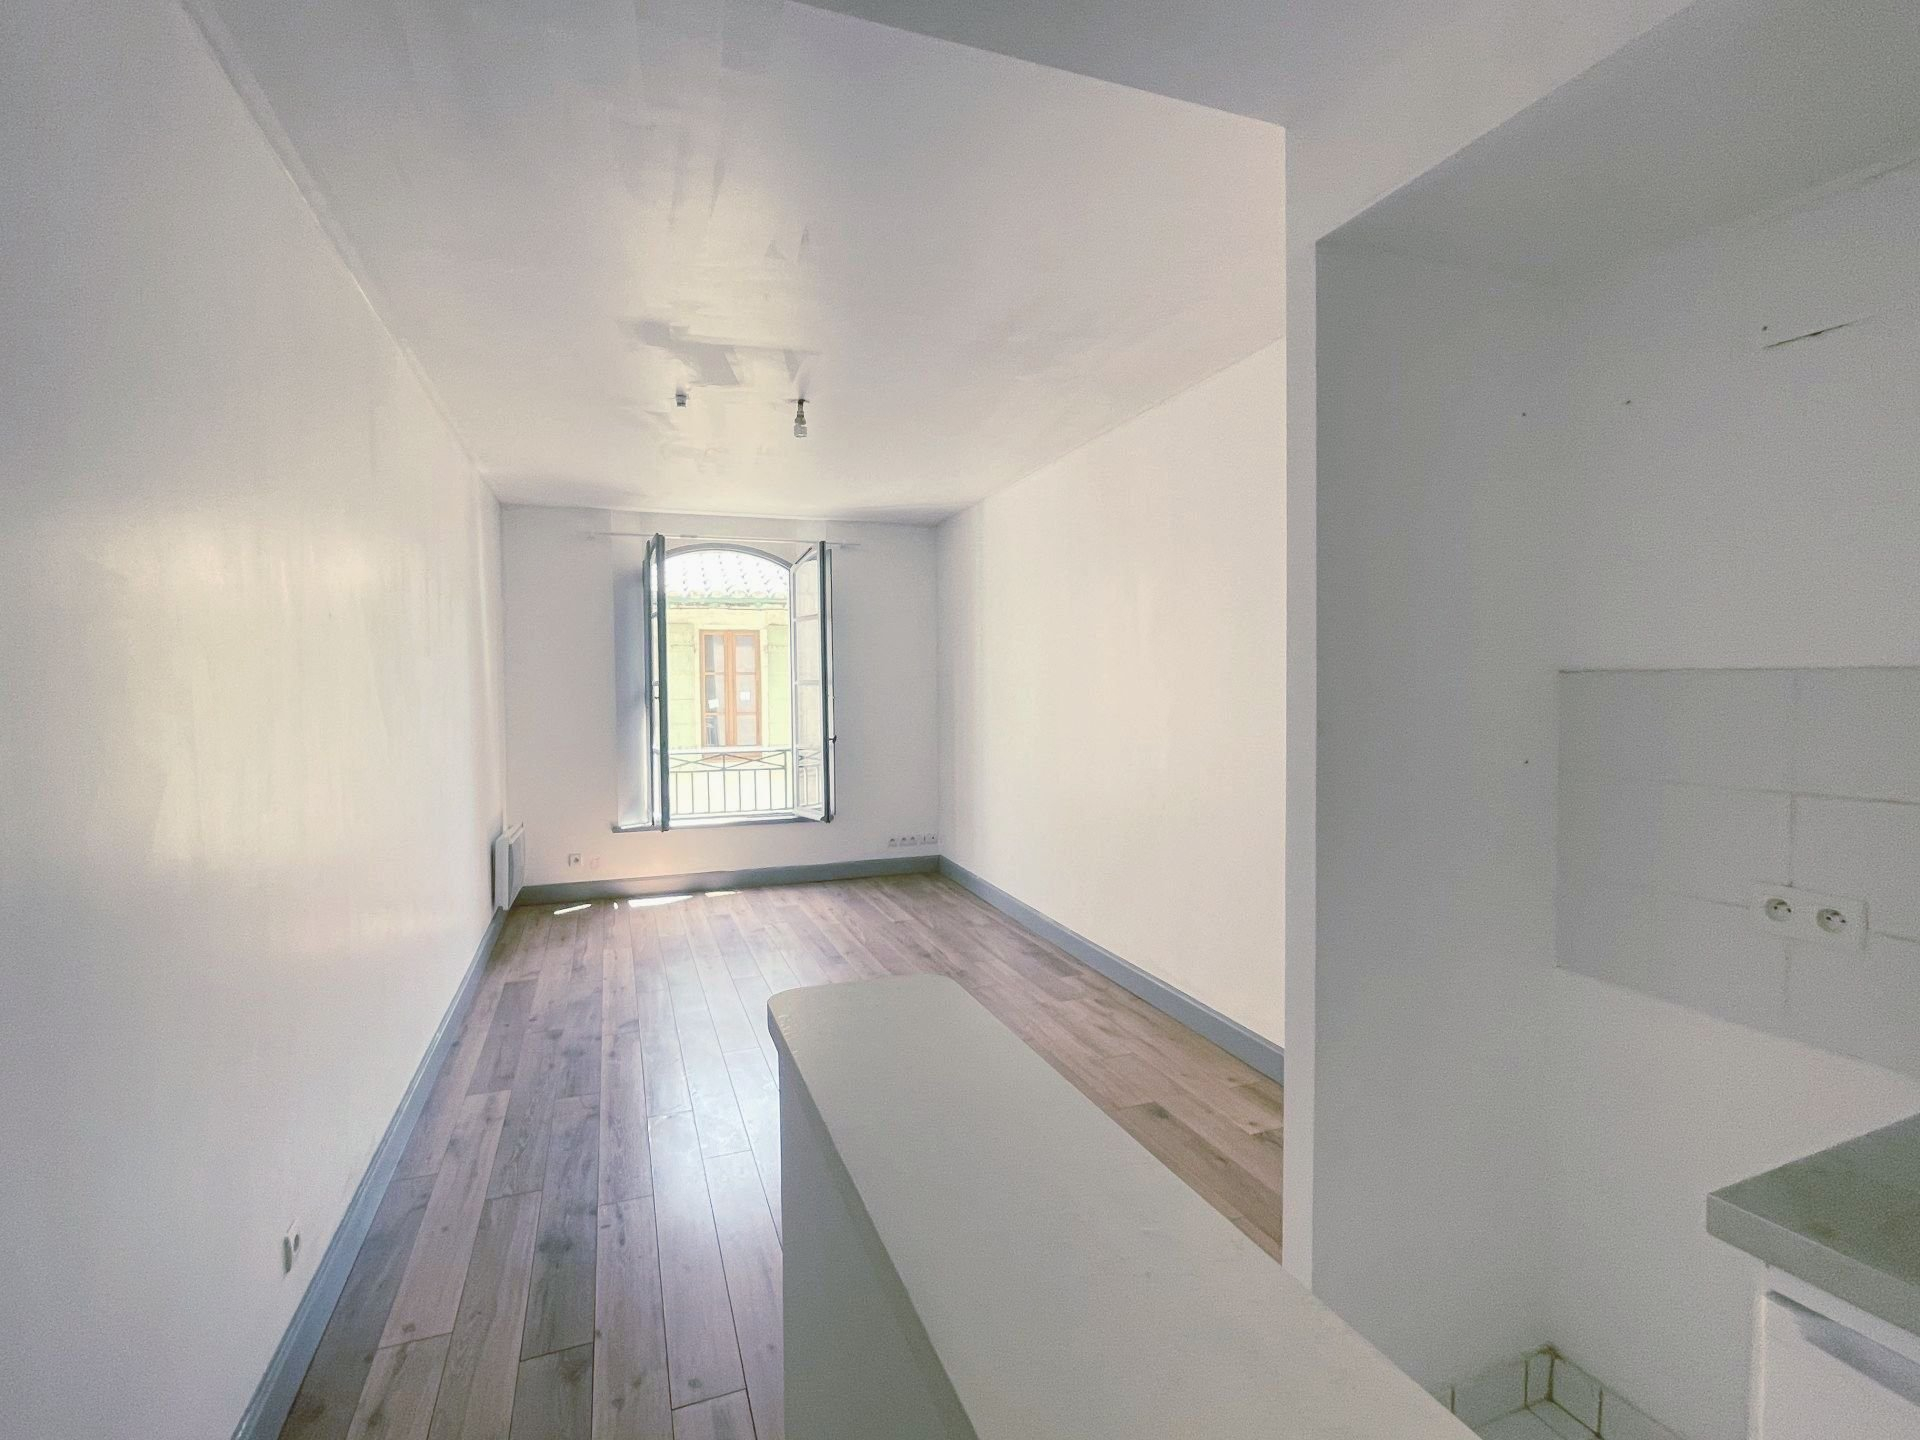 Location Appartement BEAUCAIRE Mandat : 1009-105